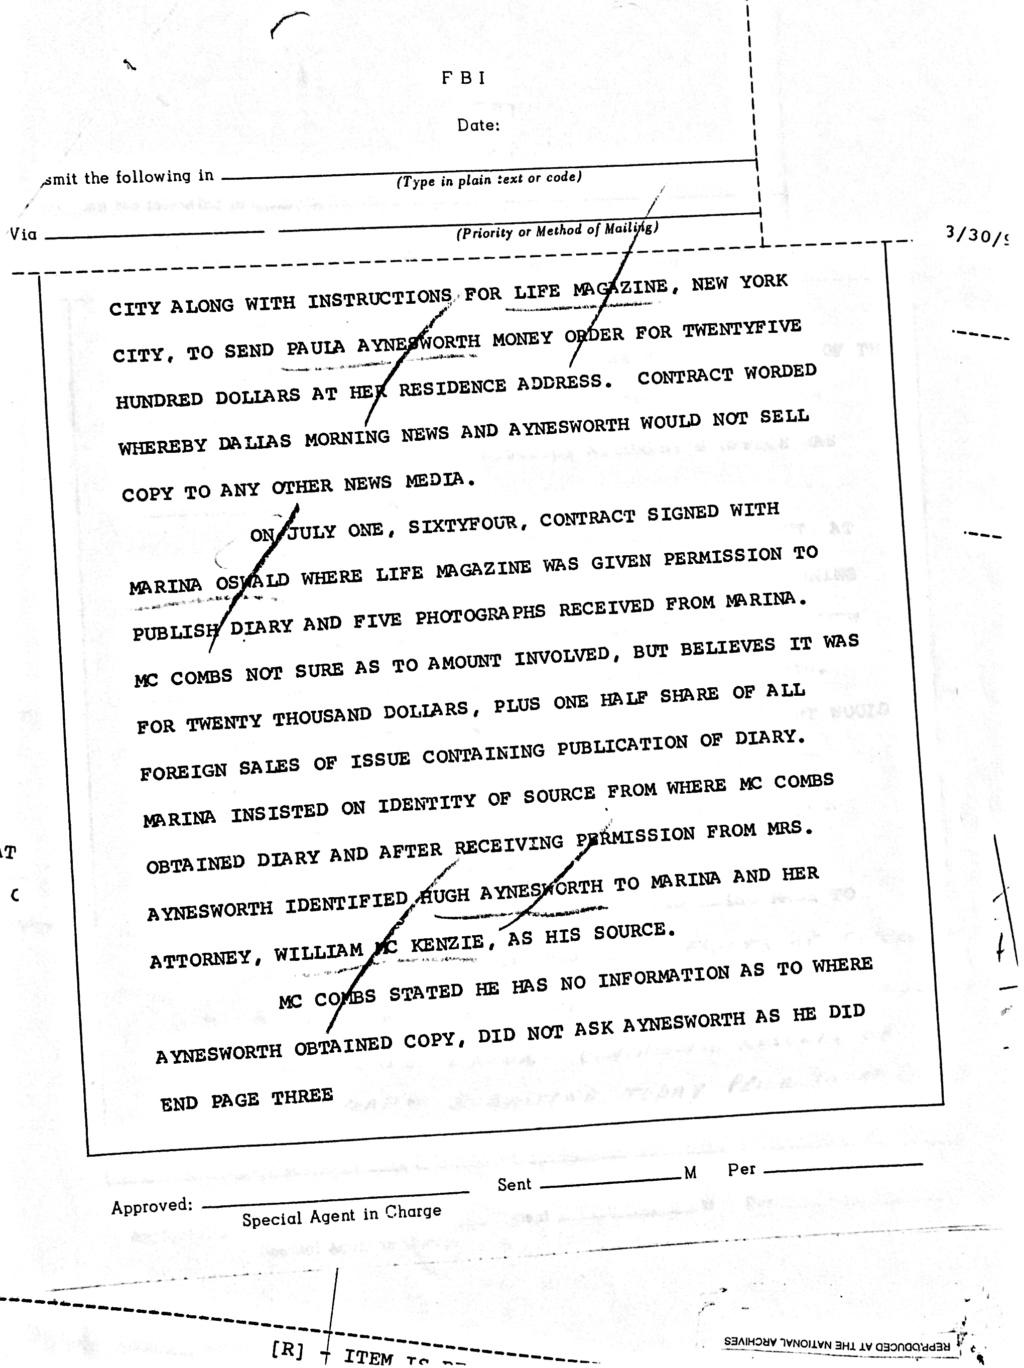 Hugh Aynesworth offered to snitch on William Walter for the FBI 81c0af10